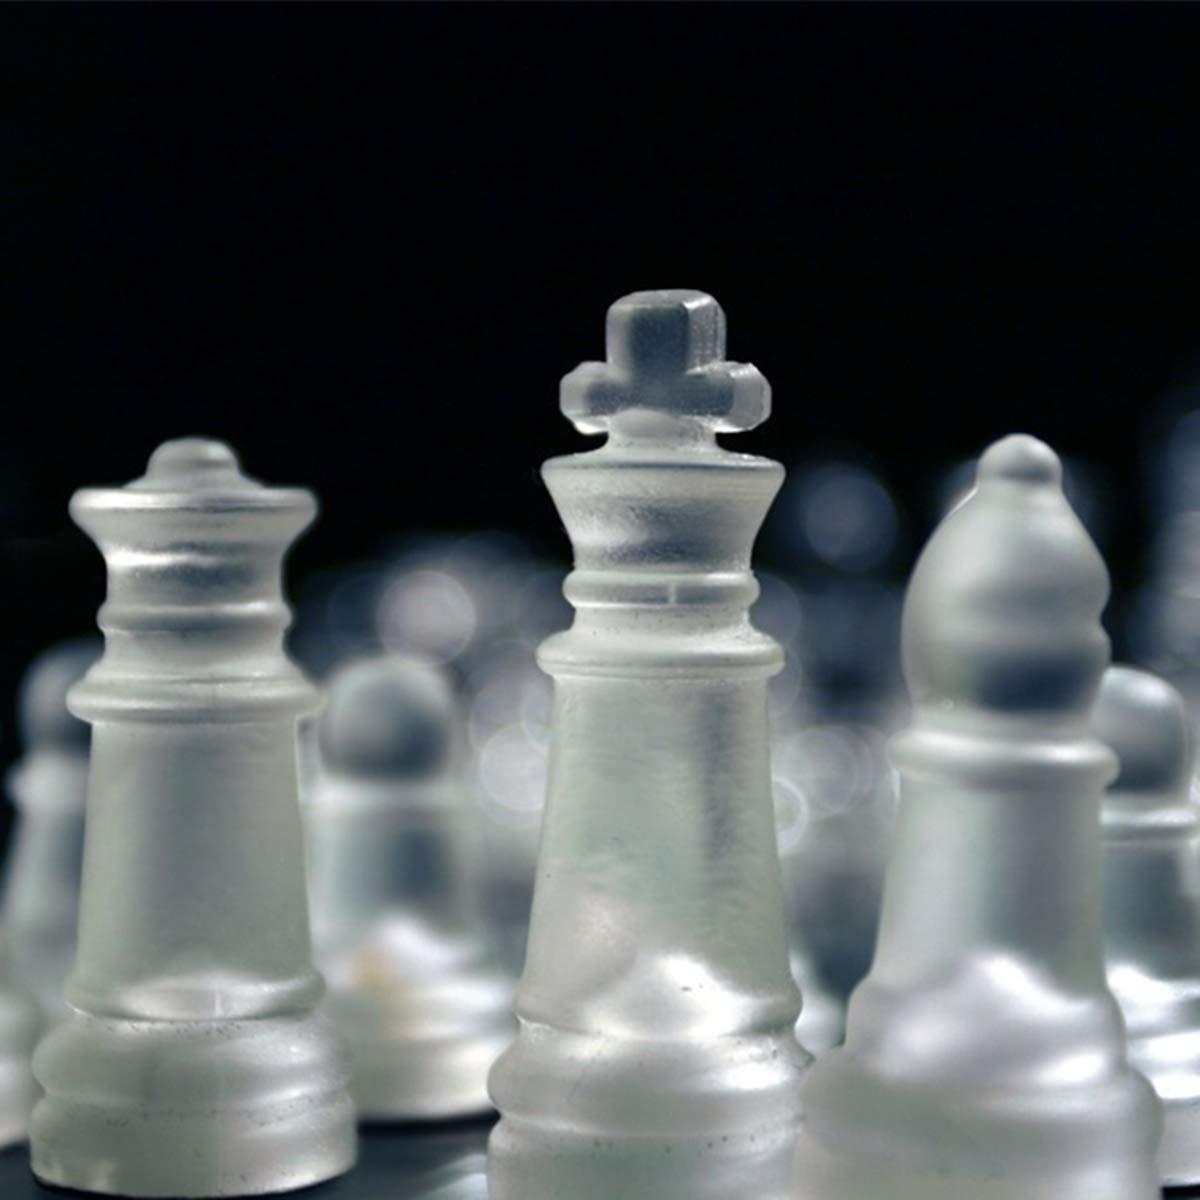 25Cm High-End Elegant K9 Checker Glass Chess Game Set Home Decorations TuToy 20 S 20//25